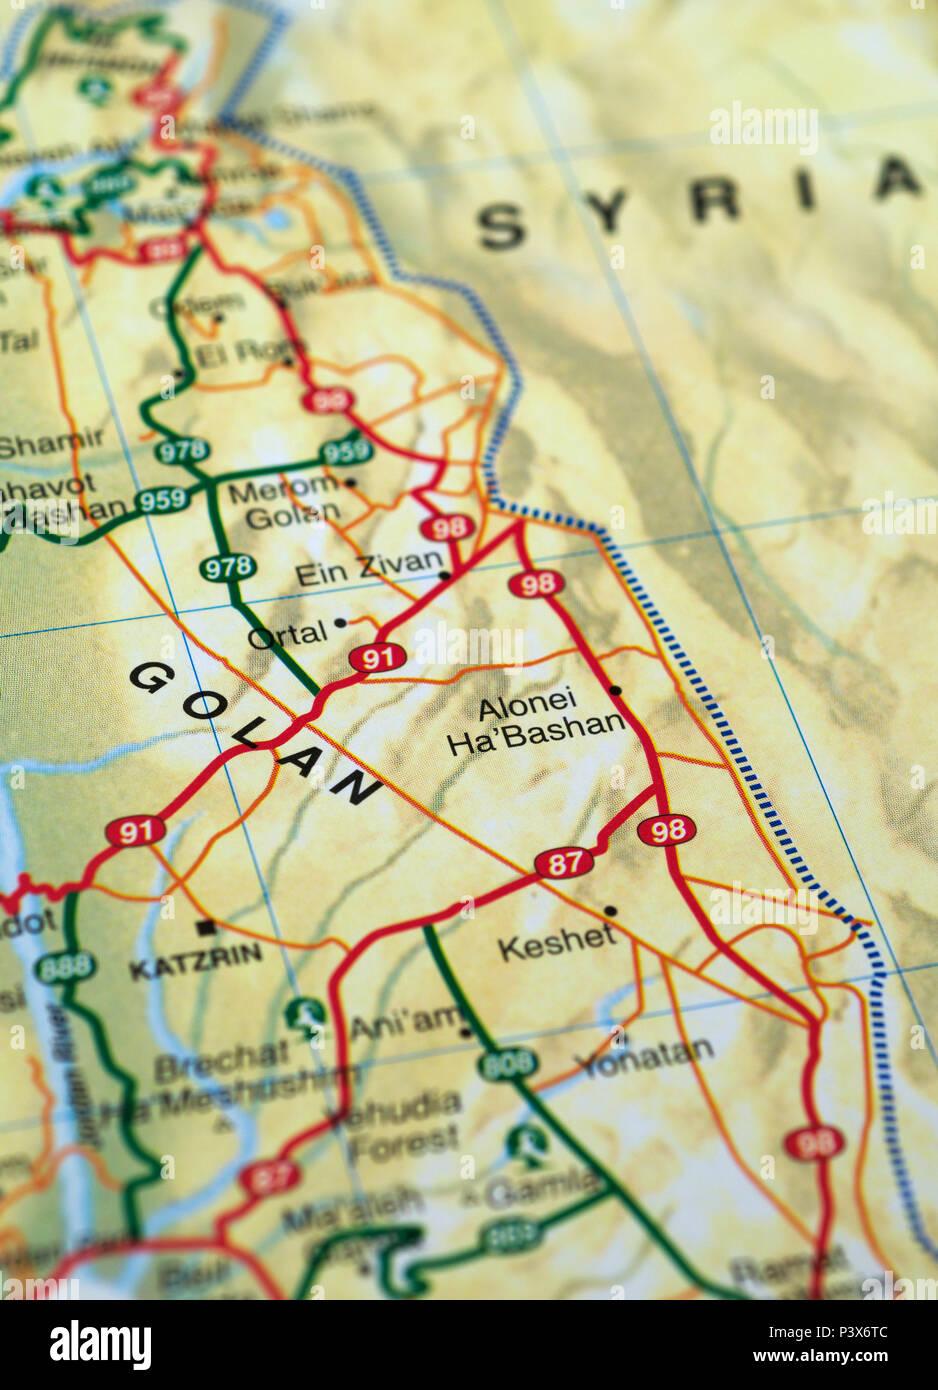 Cartina Stradale Israele.Israele Mappa Stradale Foto Stock Alamy